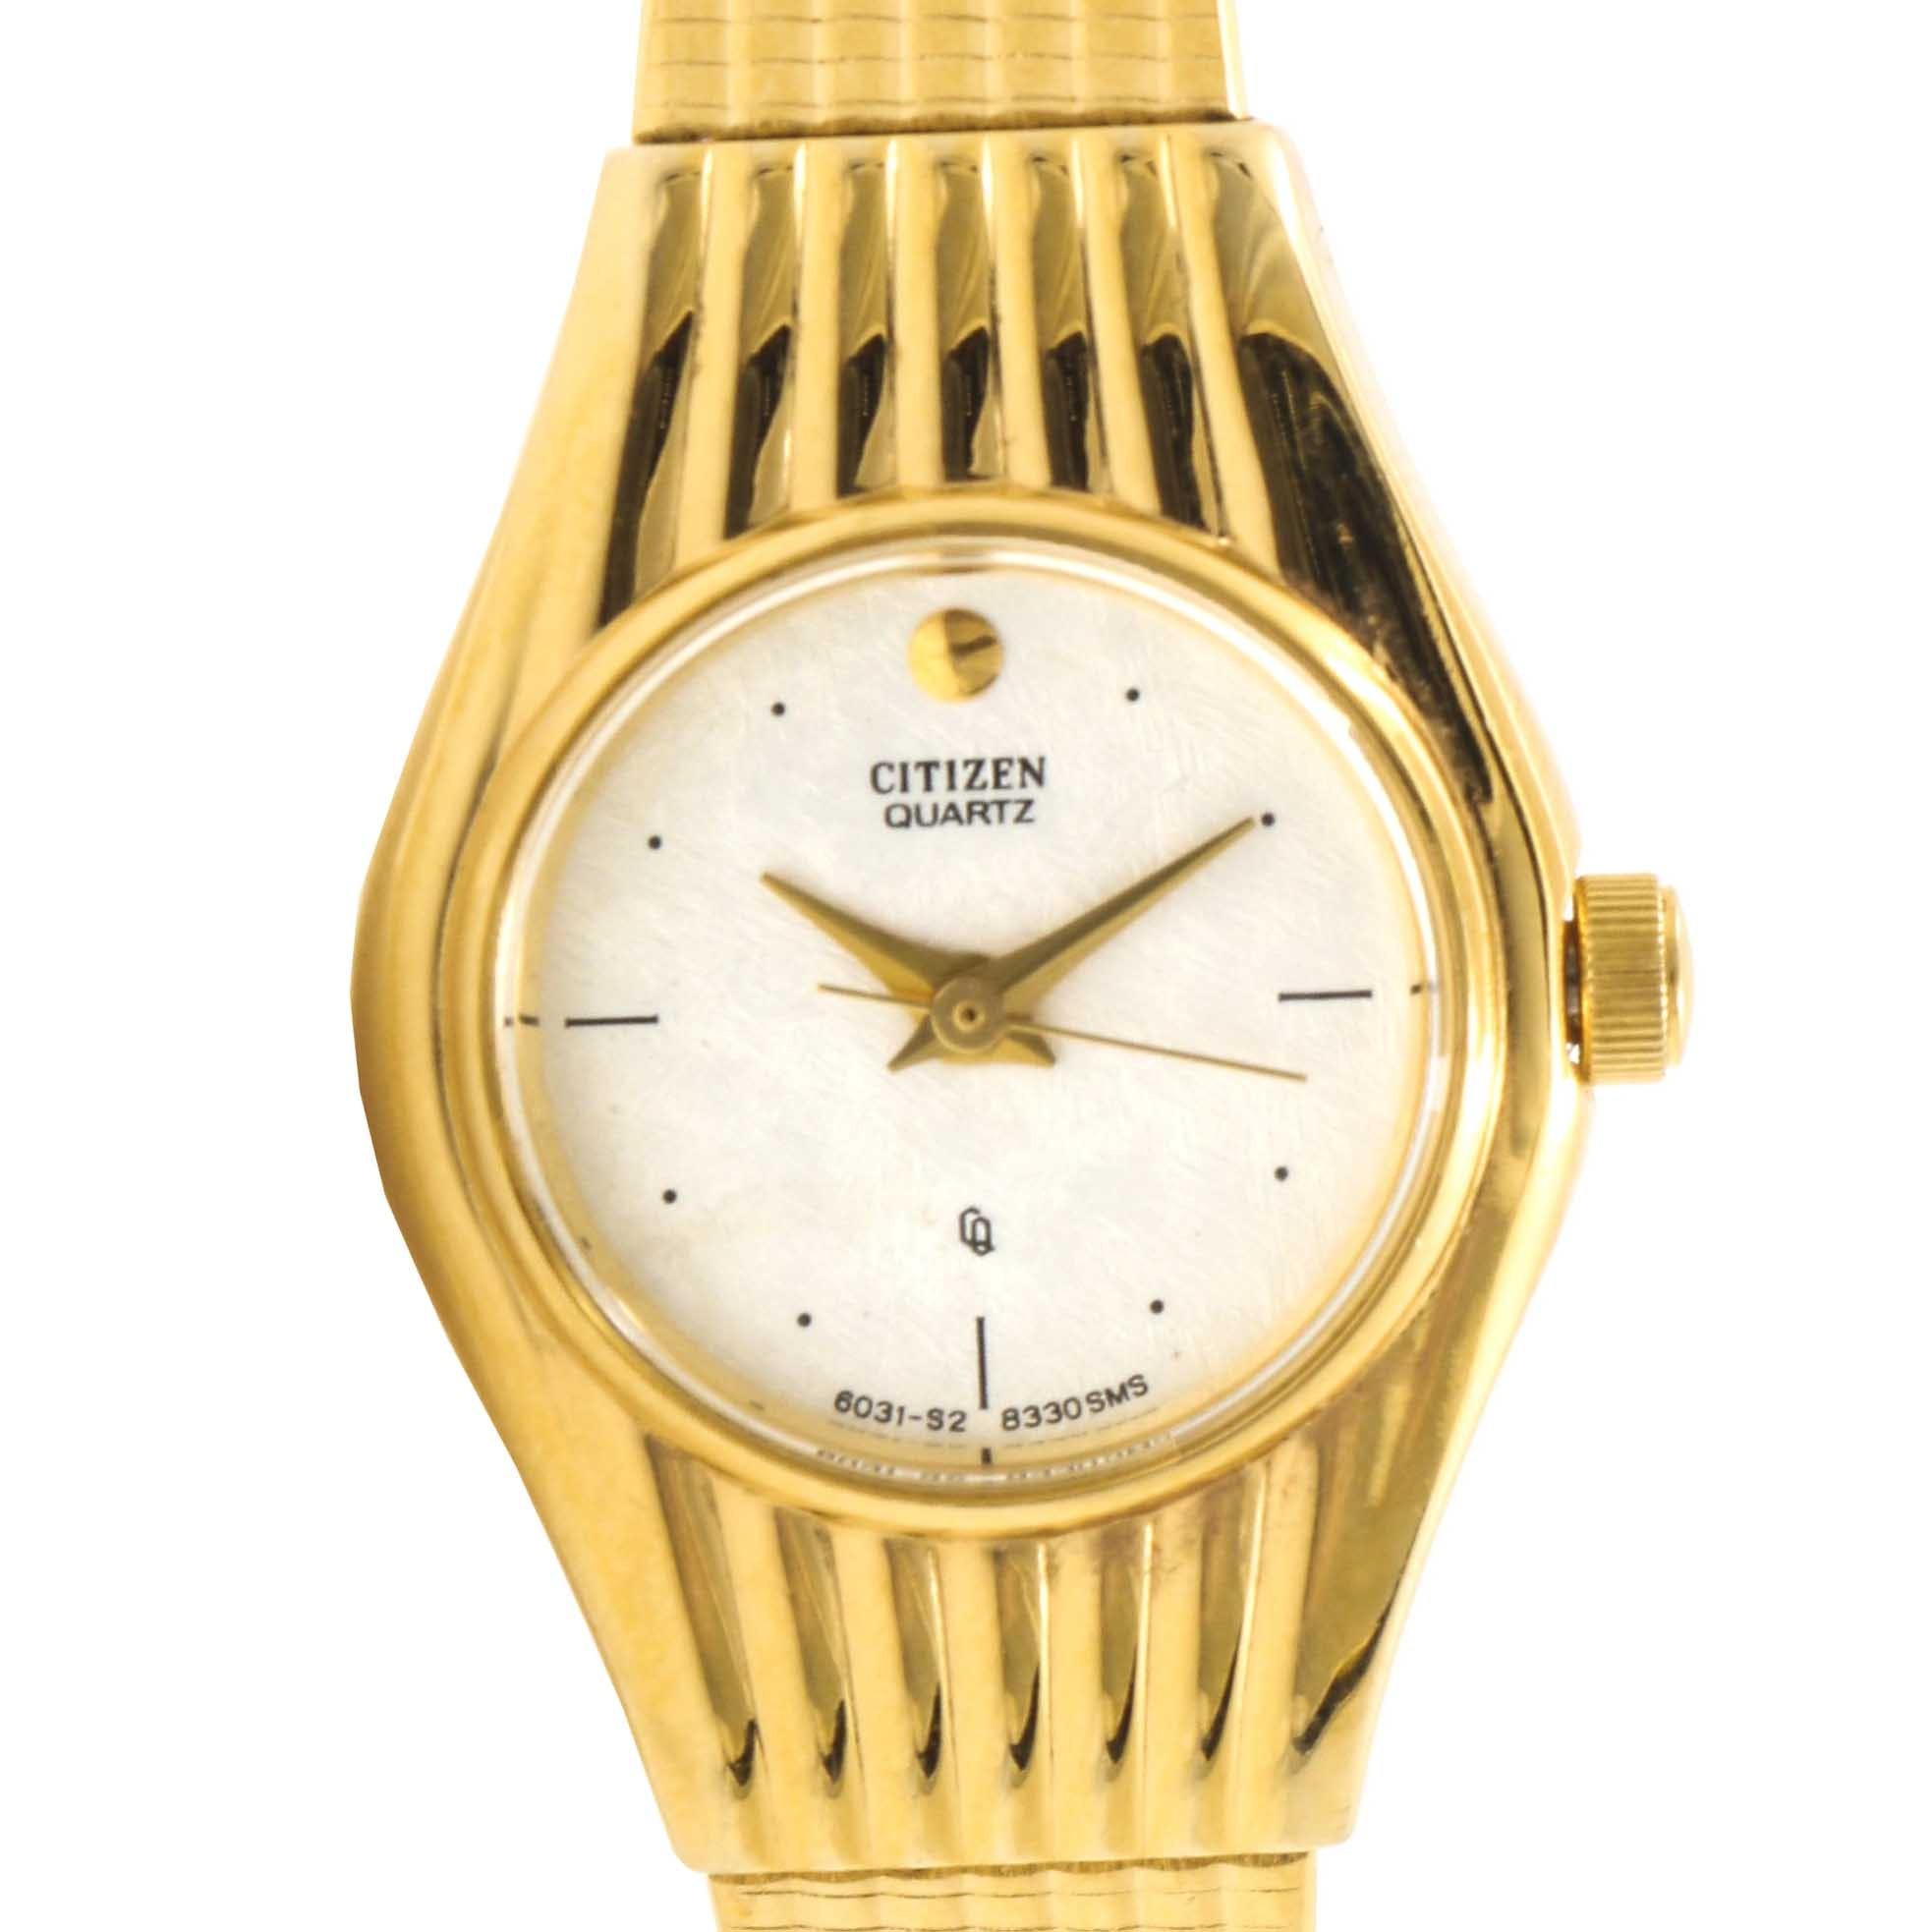 Citizen Gold Tone Wristwatch